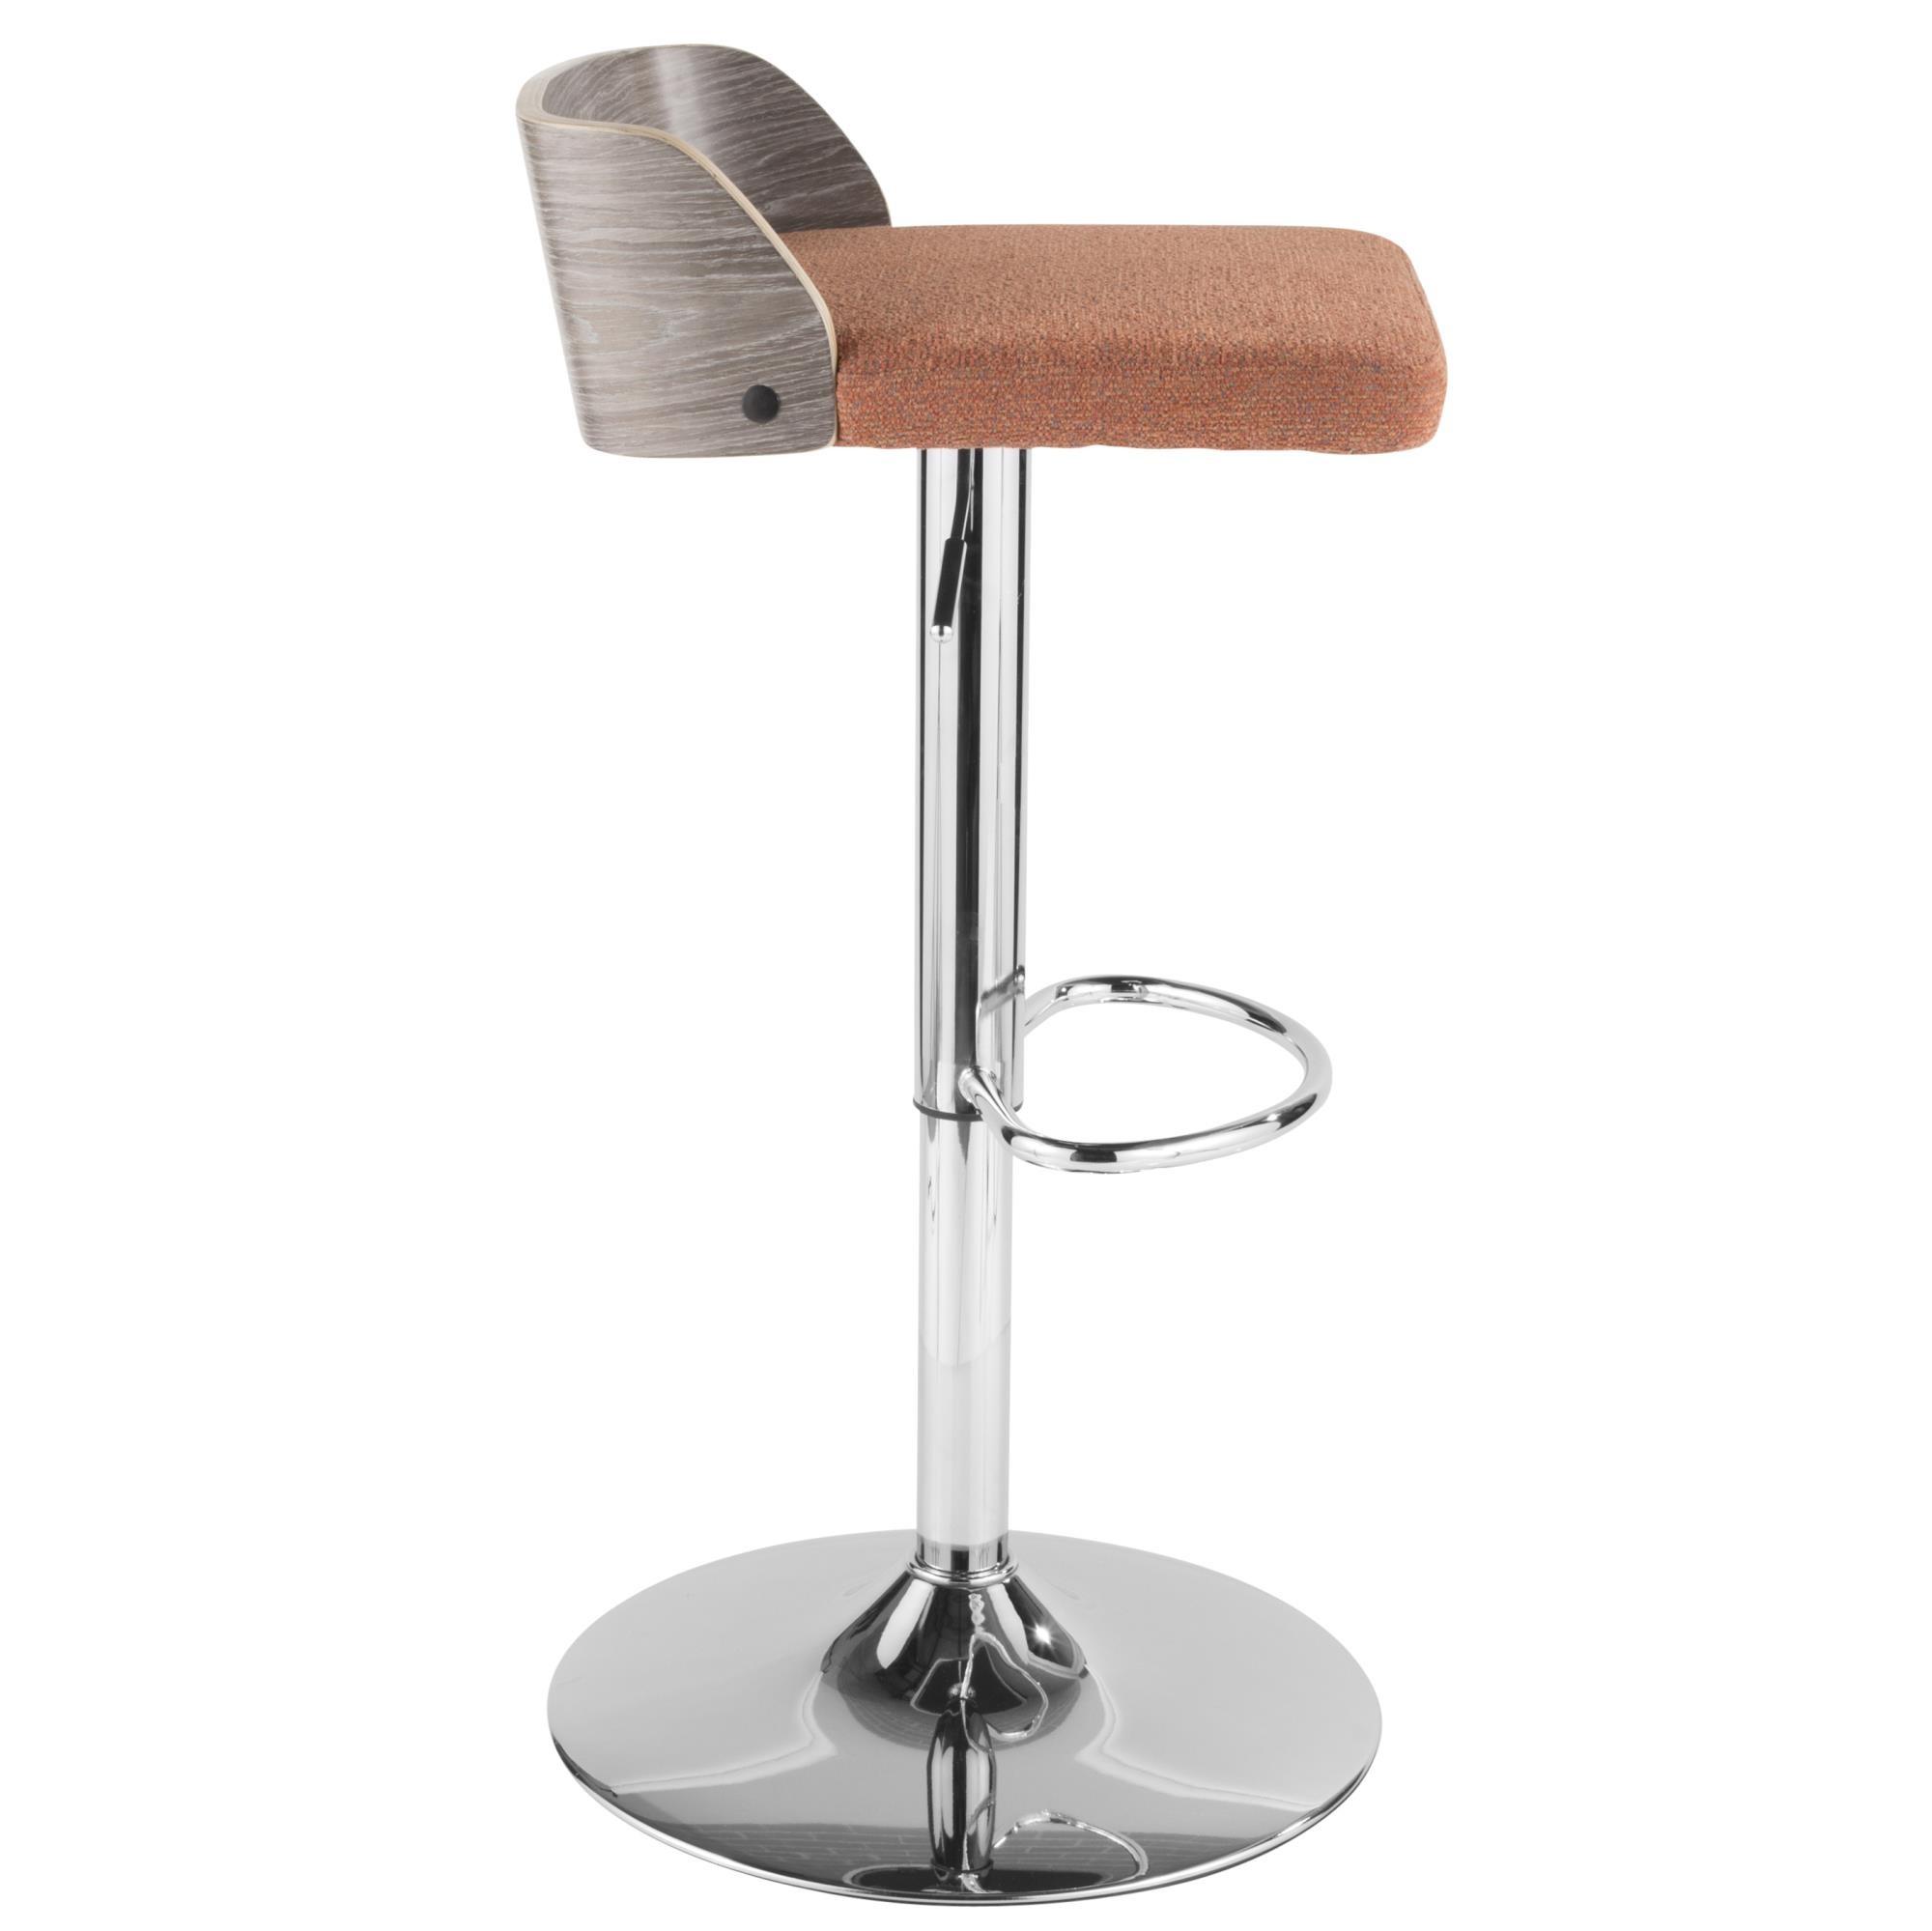 Outstanding Maya Barstool Lumisource Stylish Decor At Affordable Prices Evergreenethics Interior Chair Design Evergreenethicsorg